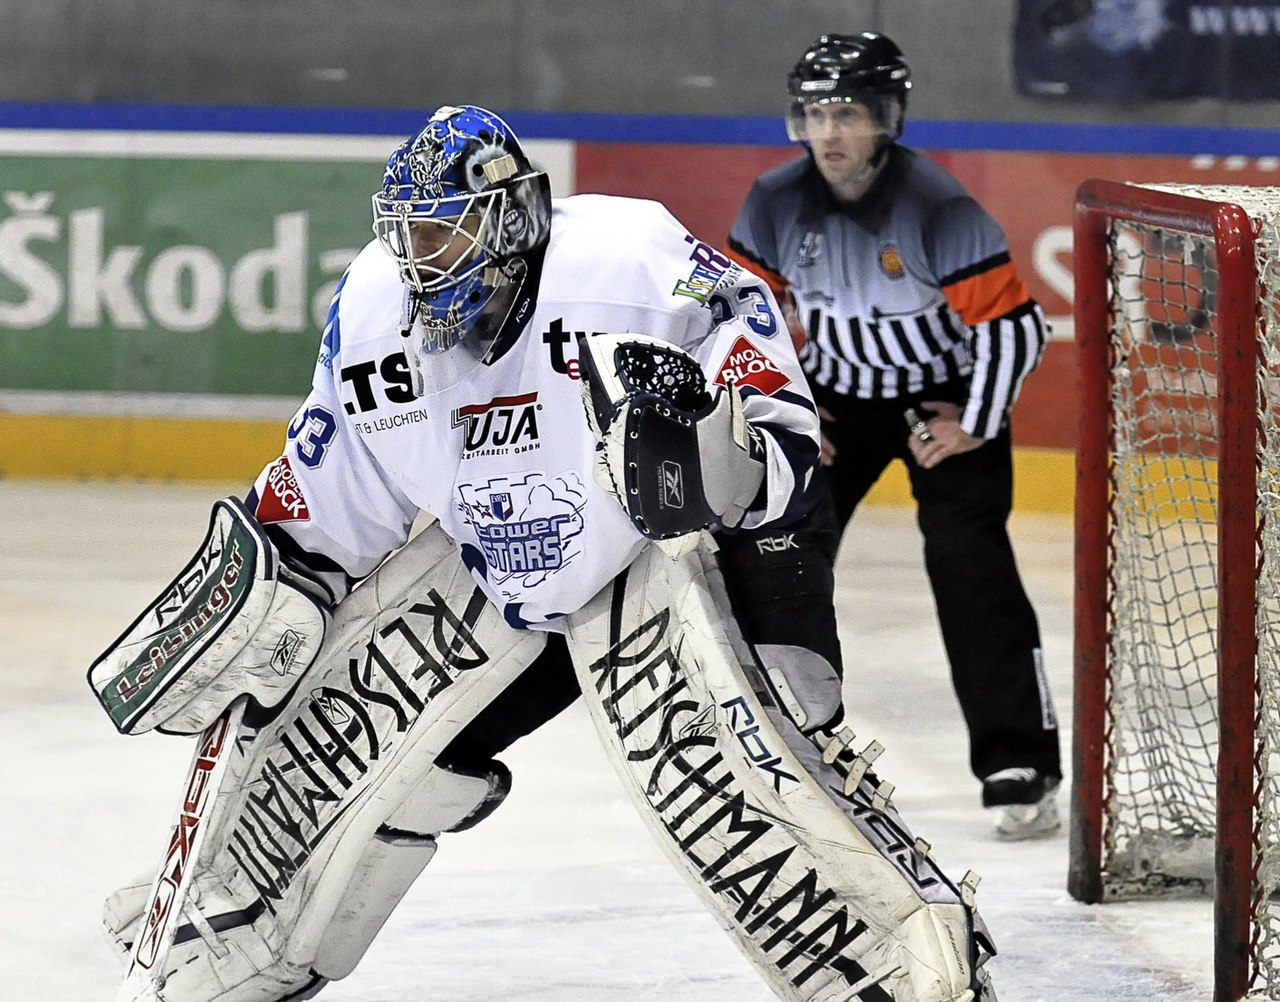 Christian Rohde